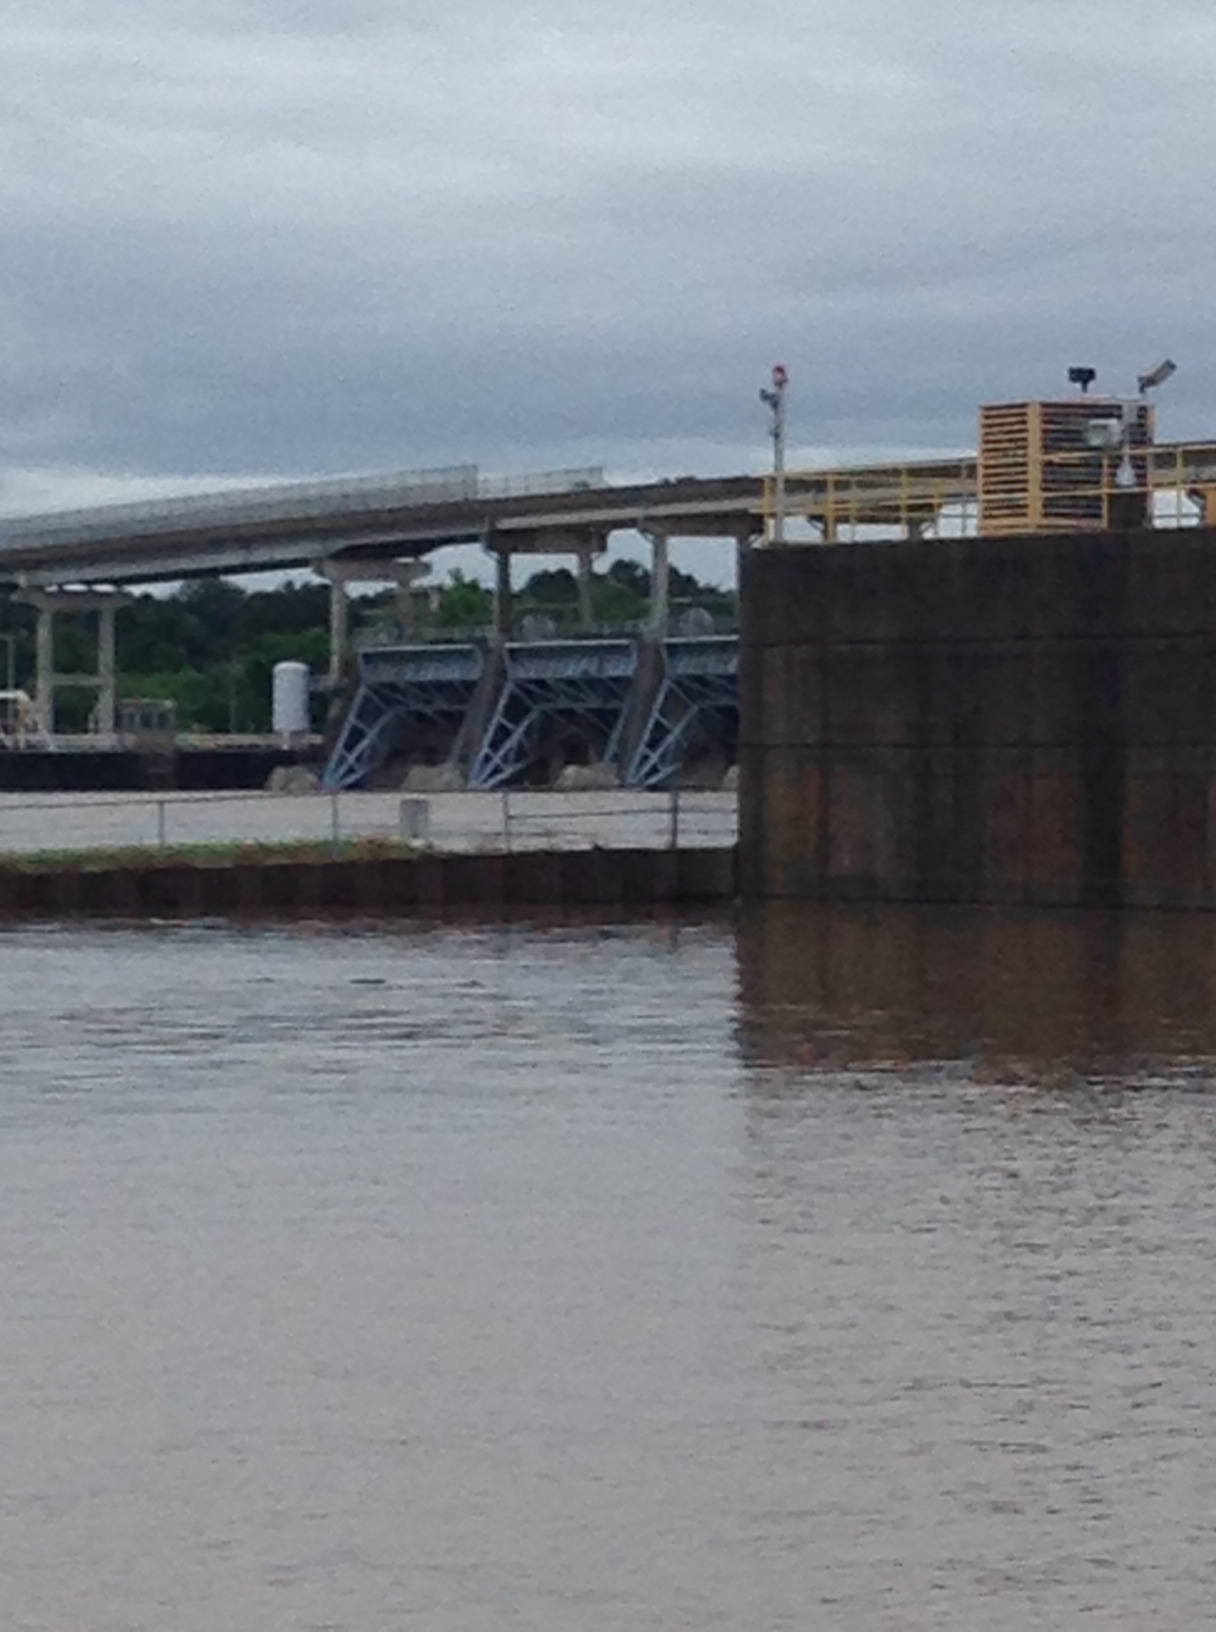 Open gates at Barling Dam from 5NEWS viewer Shane Bibby